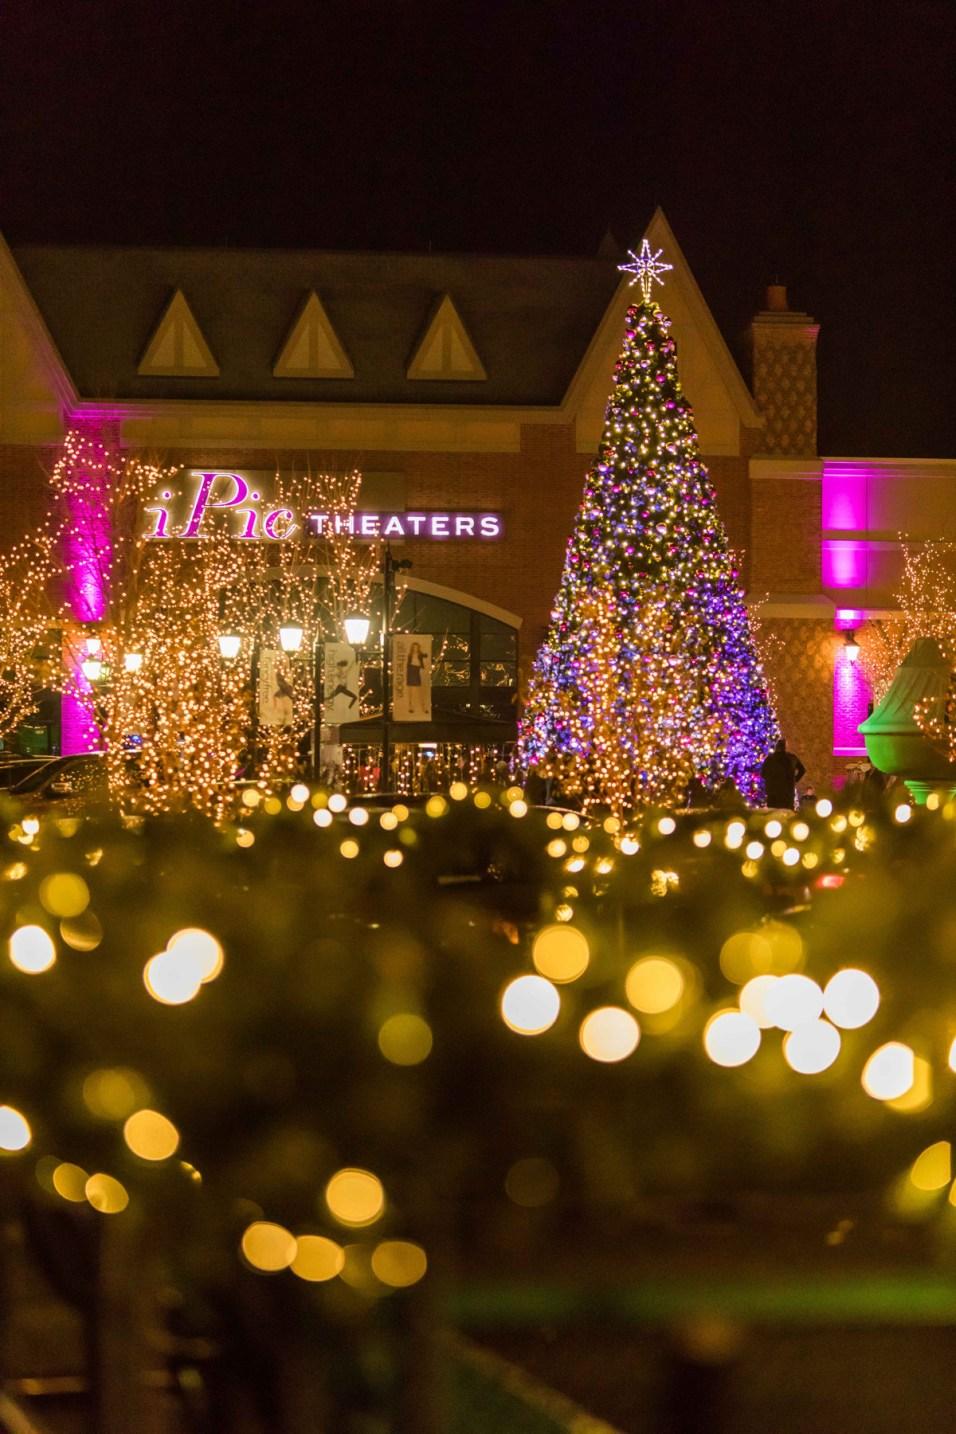 365 - Arboretum of South Barrington Holiday Tree